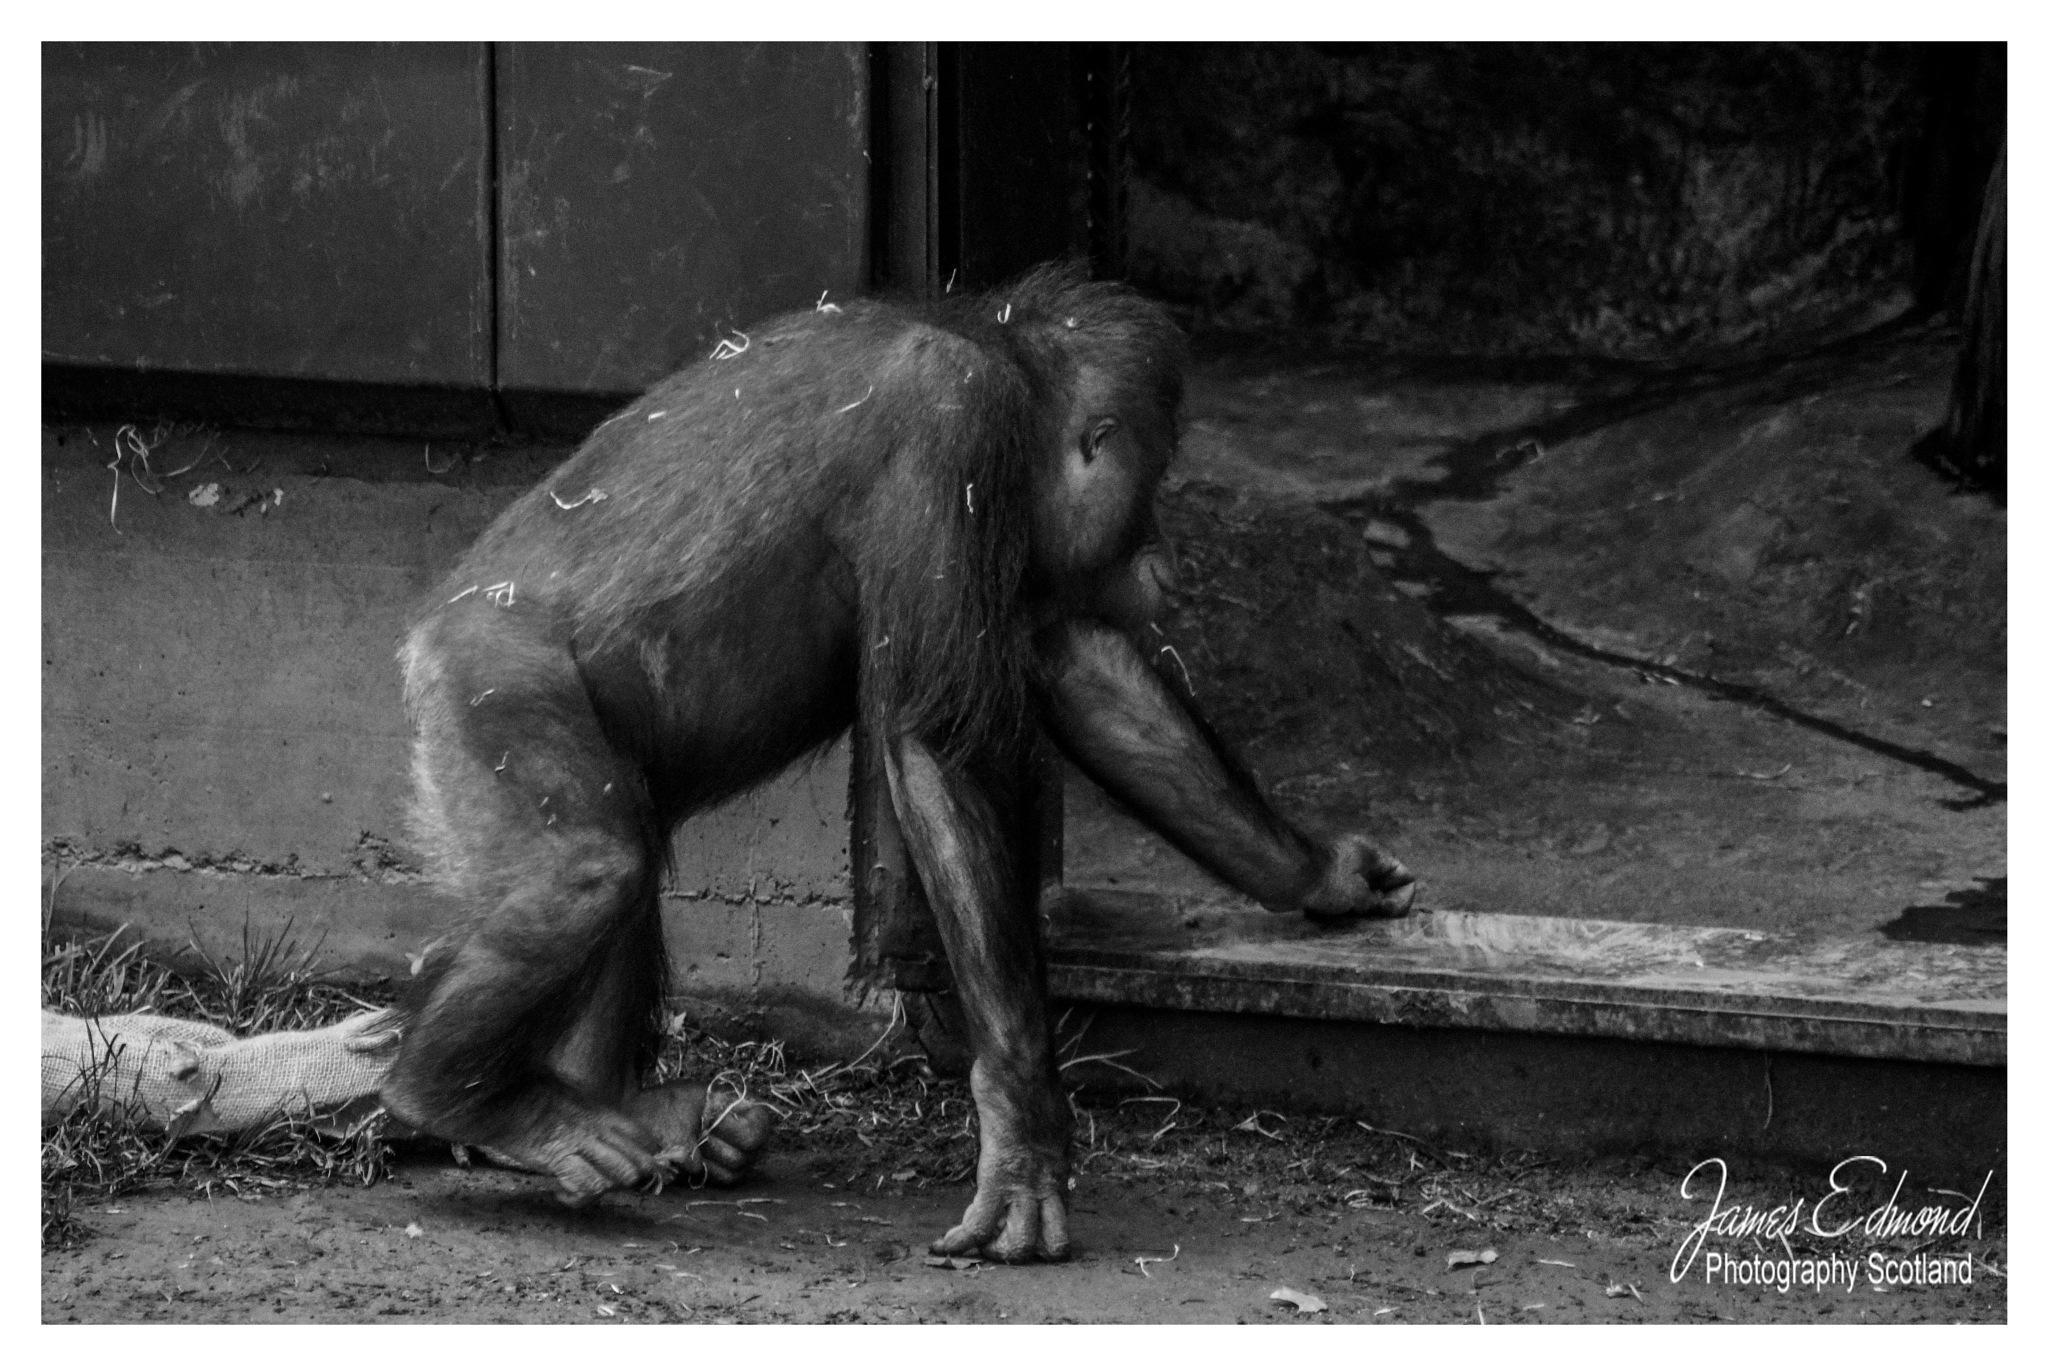 Chimp on the run by James Edmond Photography